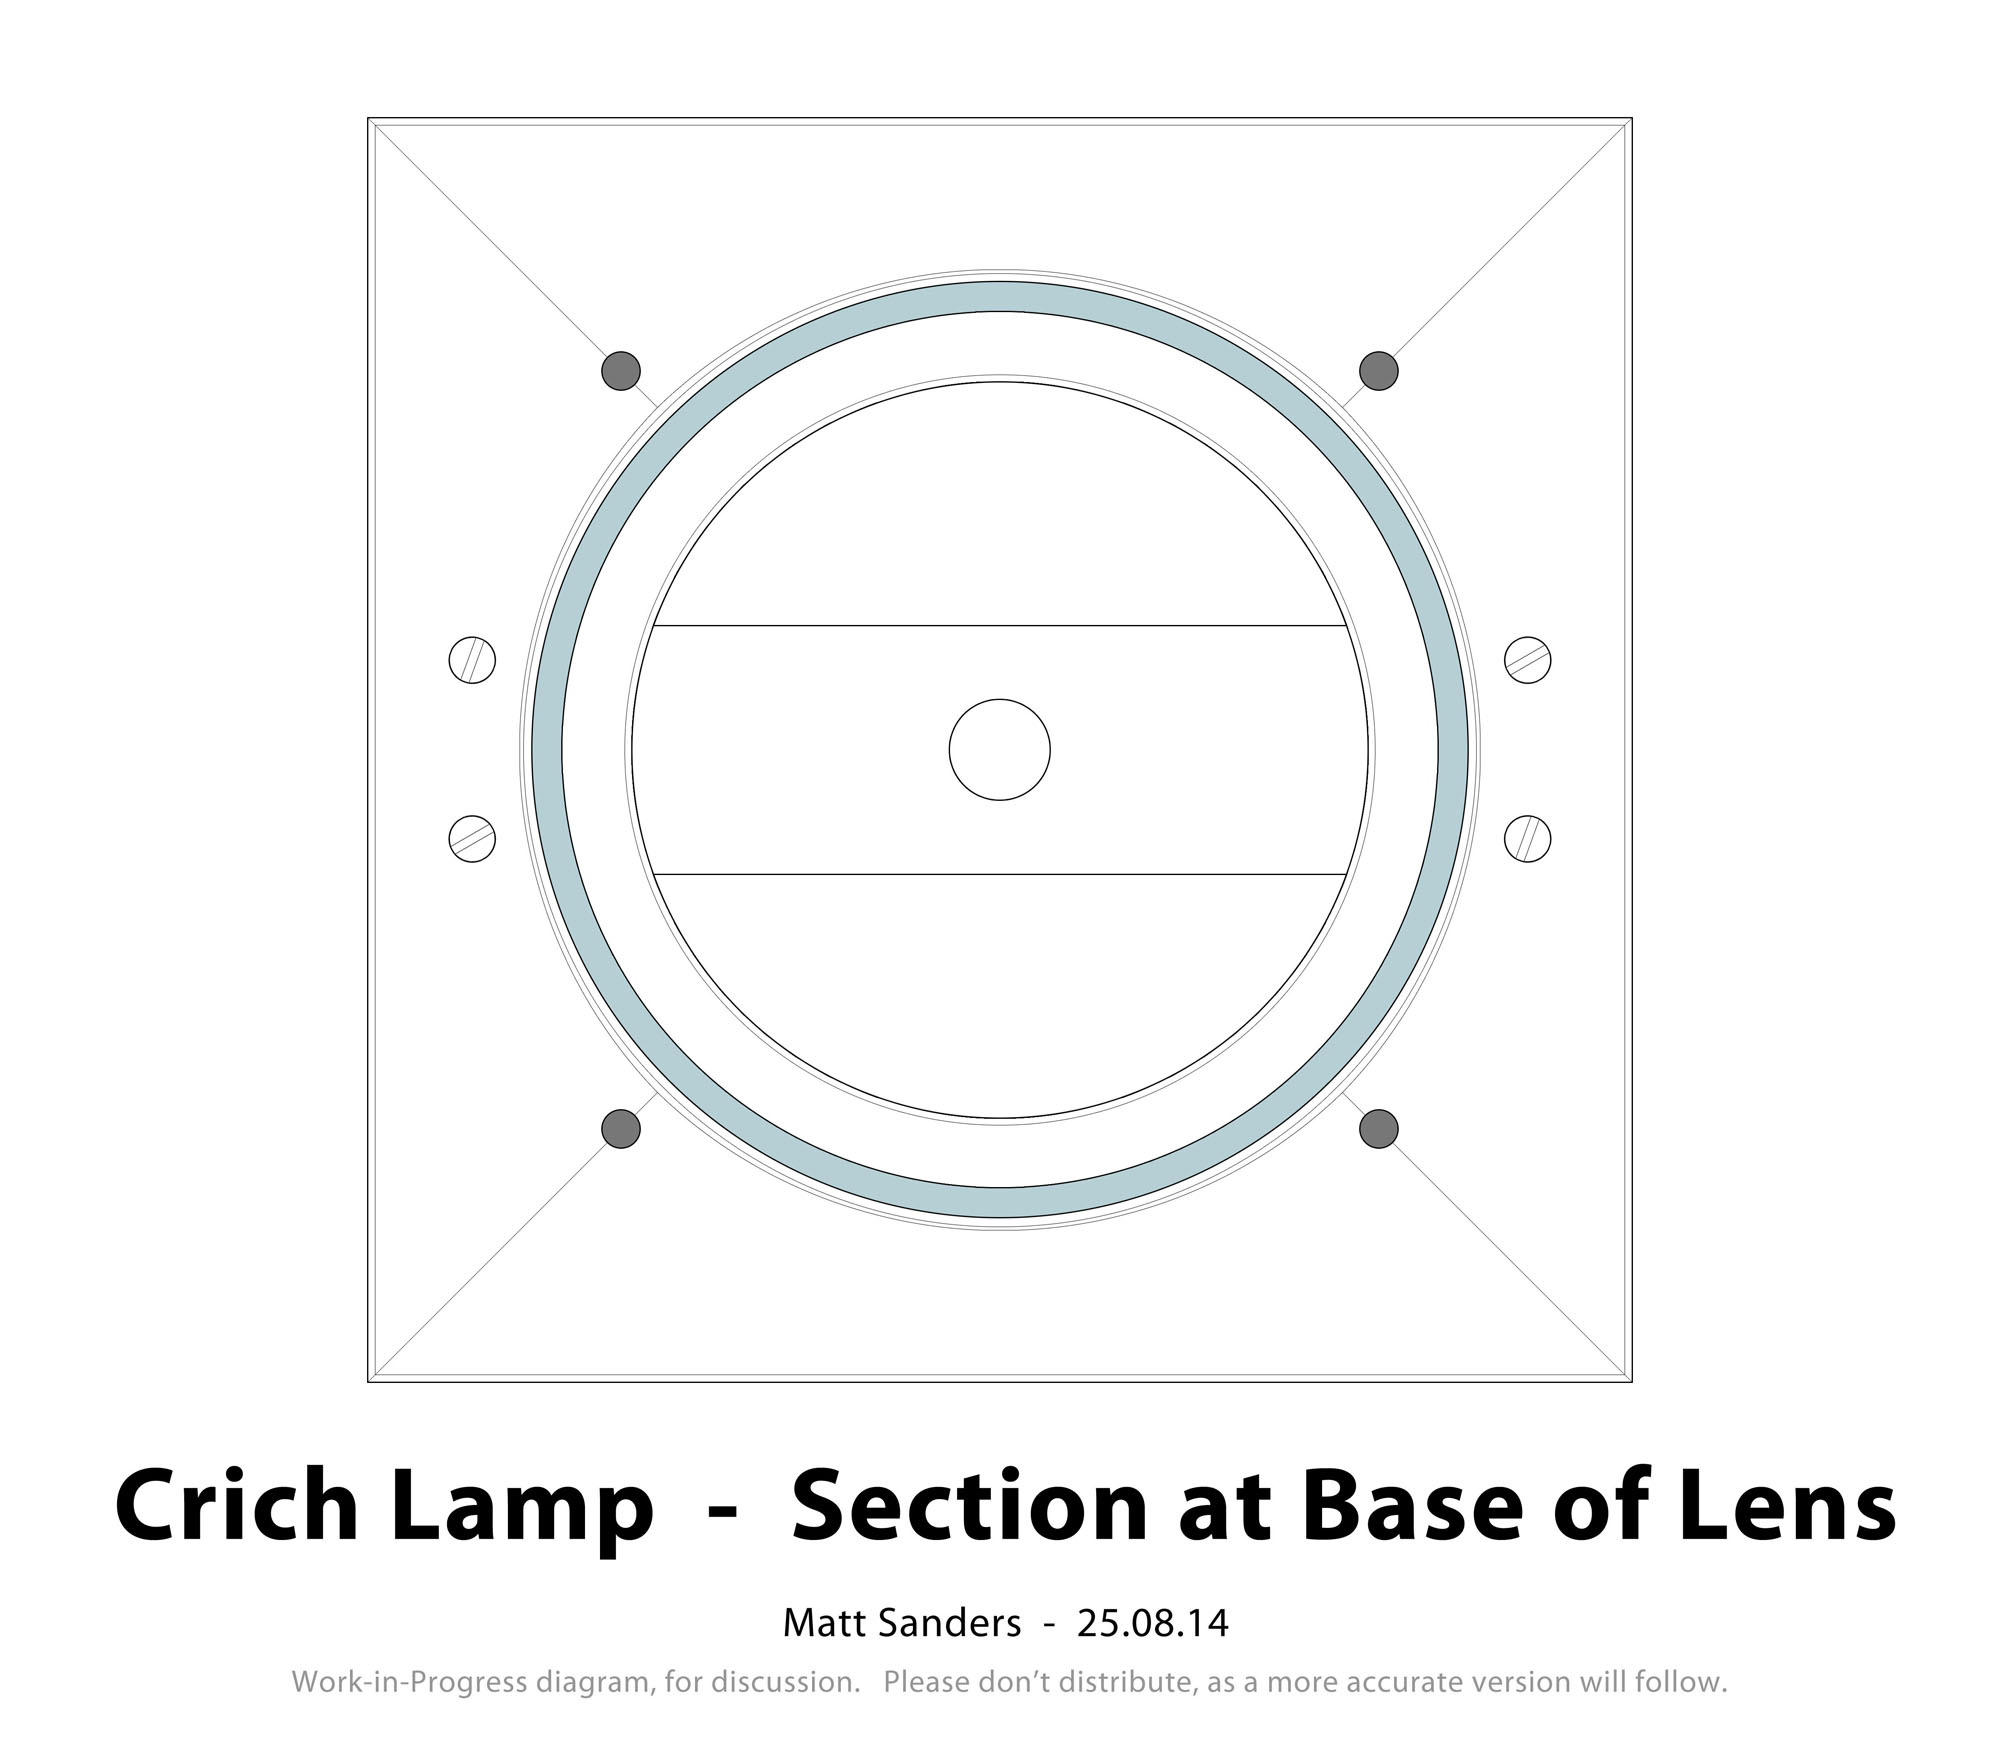 CrichLampHorizSection25Aug.jpg